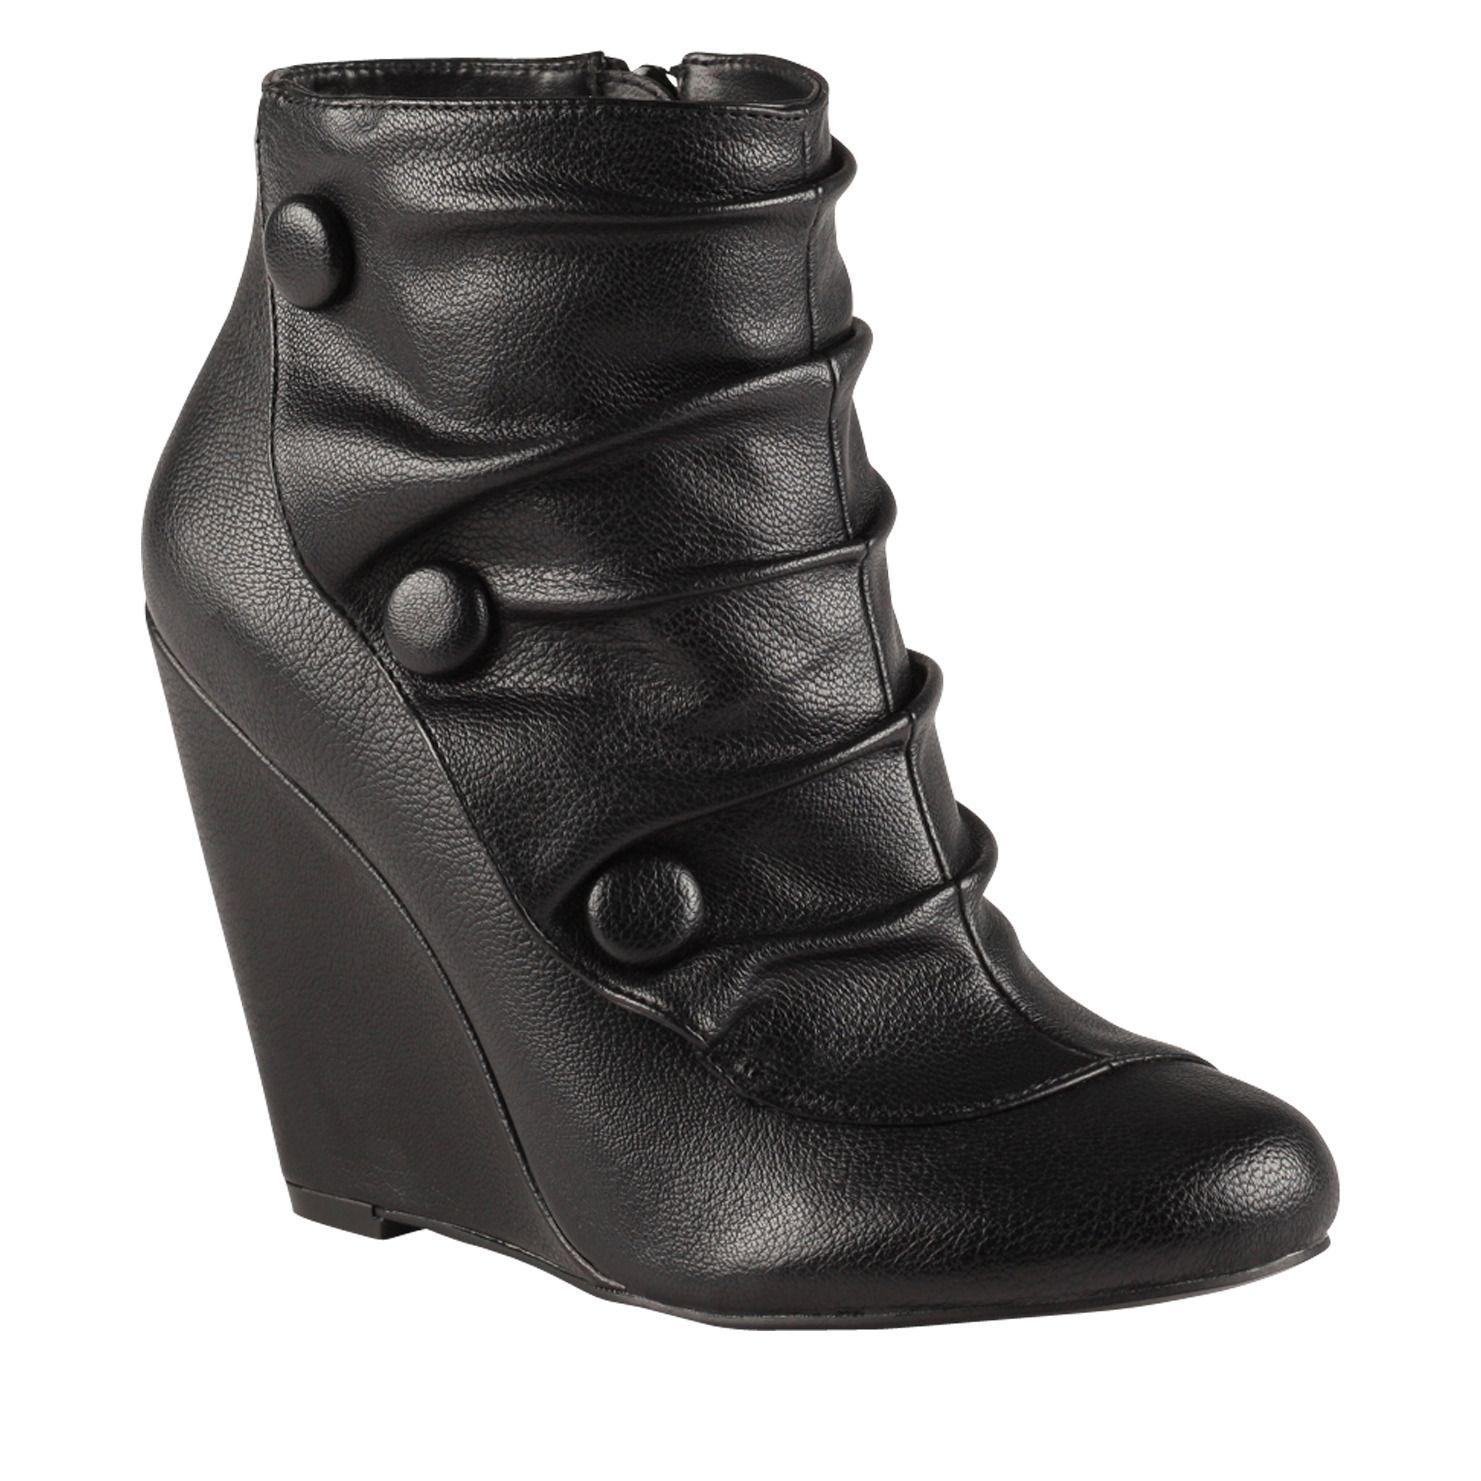 lacer dans meilleure vente les plus récents Buy TRESS women's boots ankle boots at CALL IT SPRING. Free ...